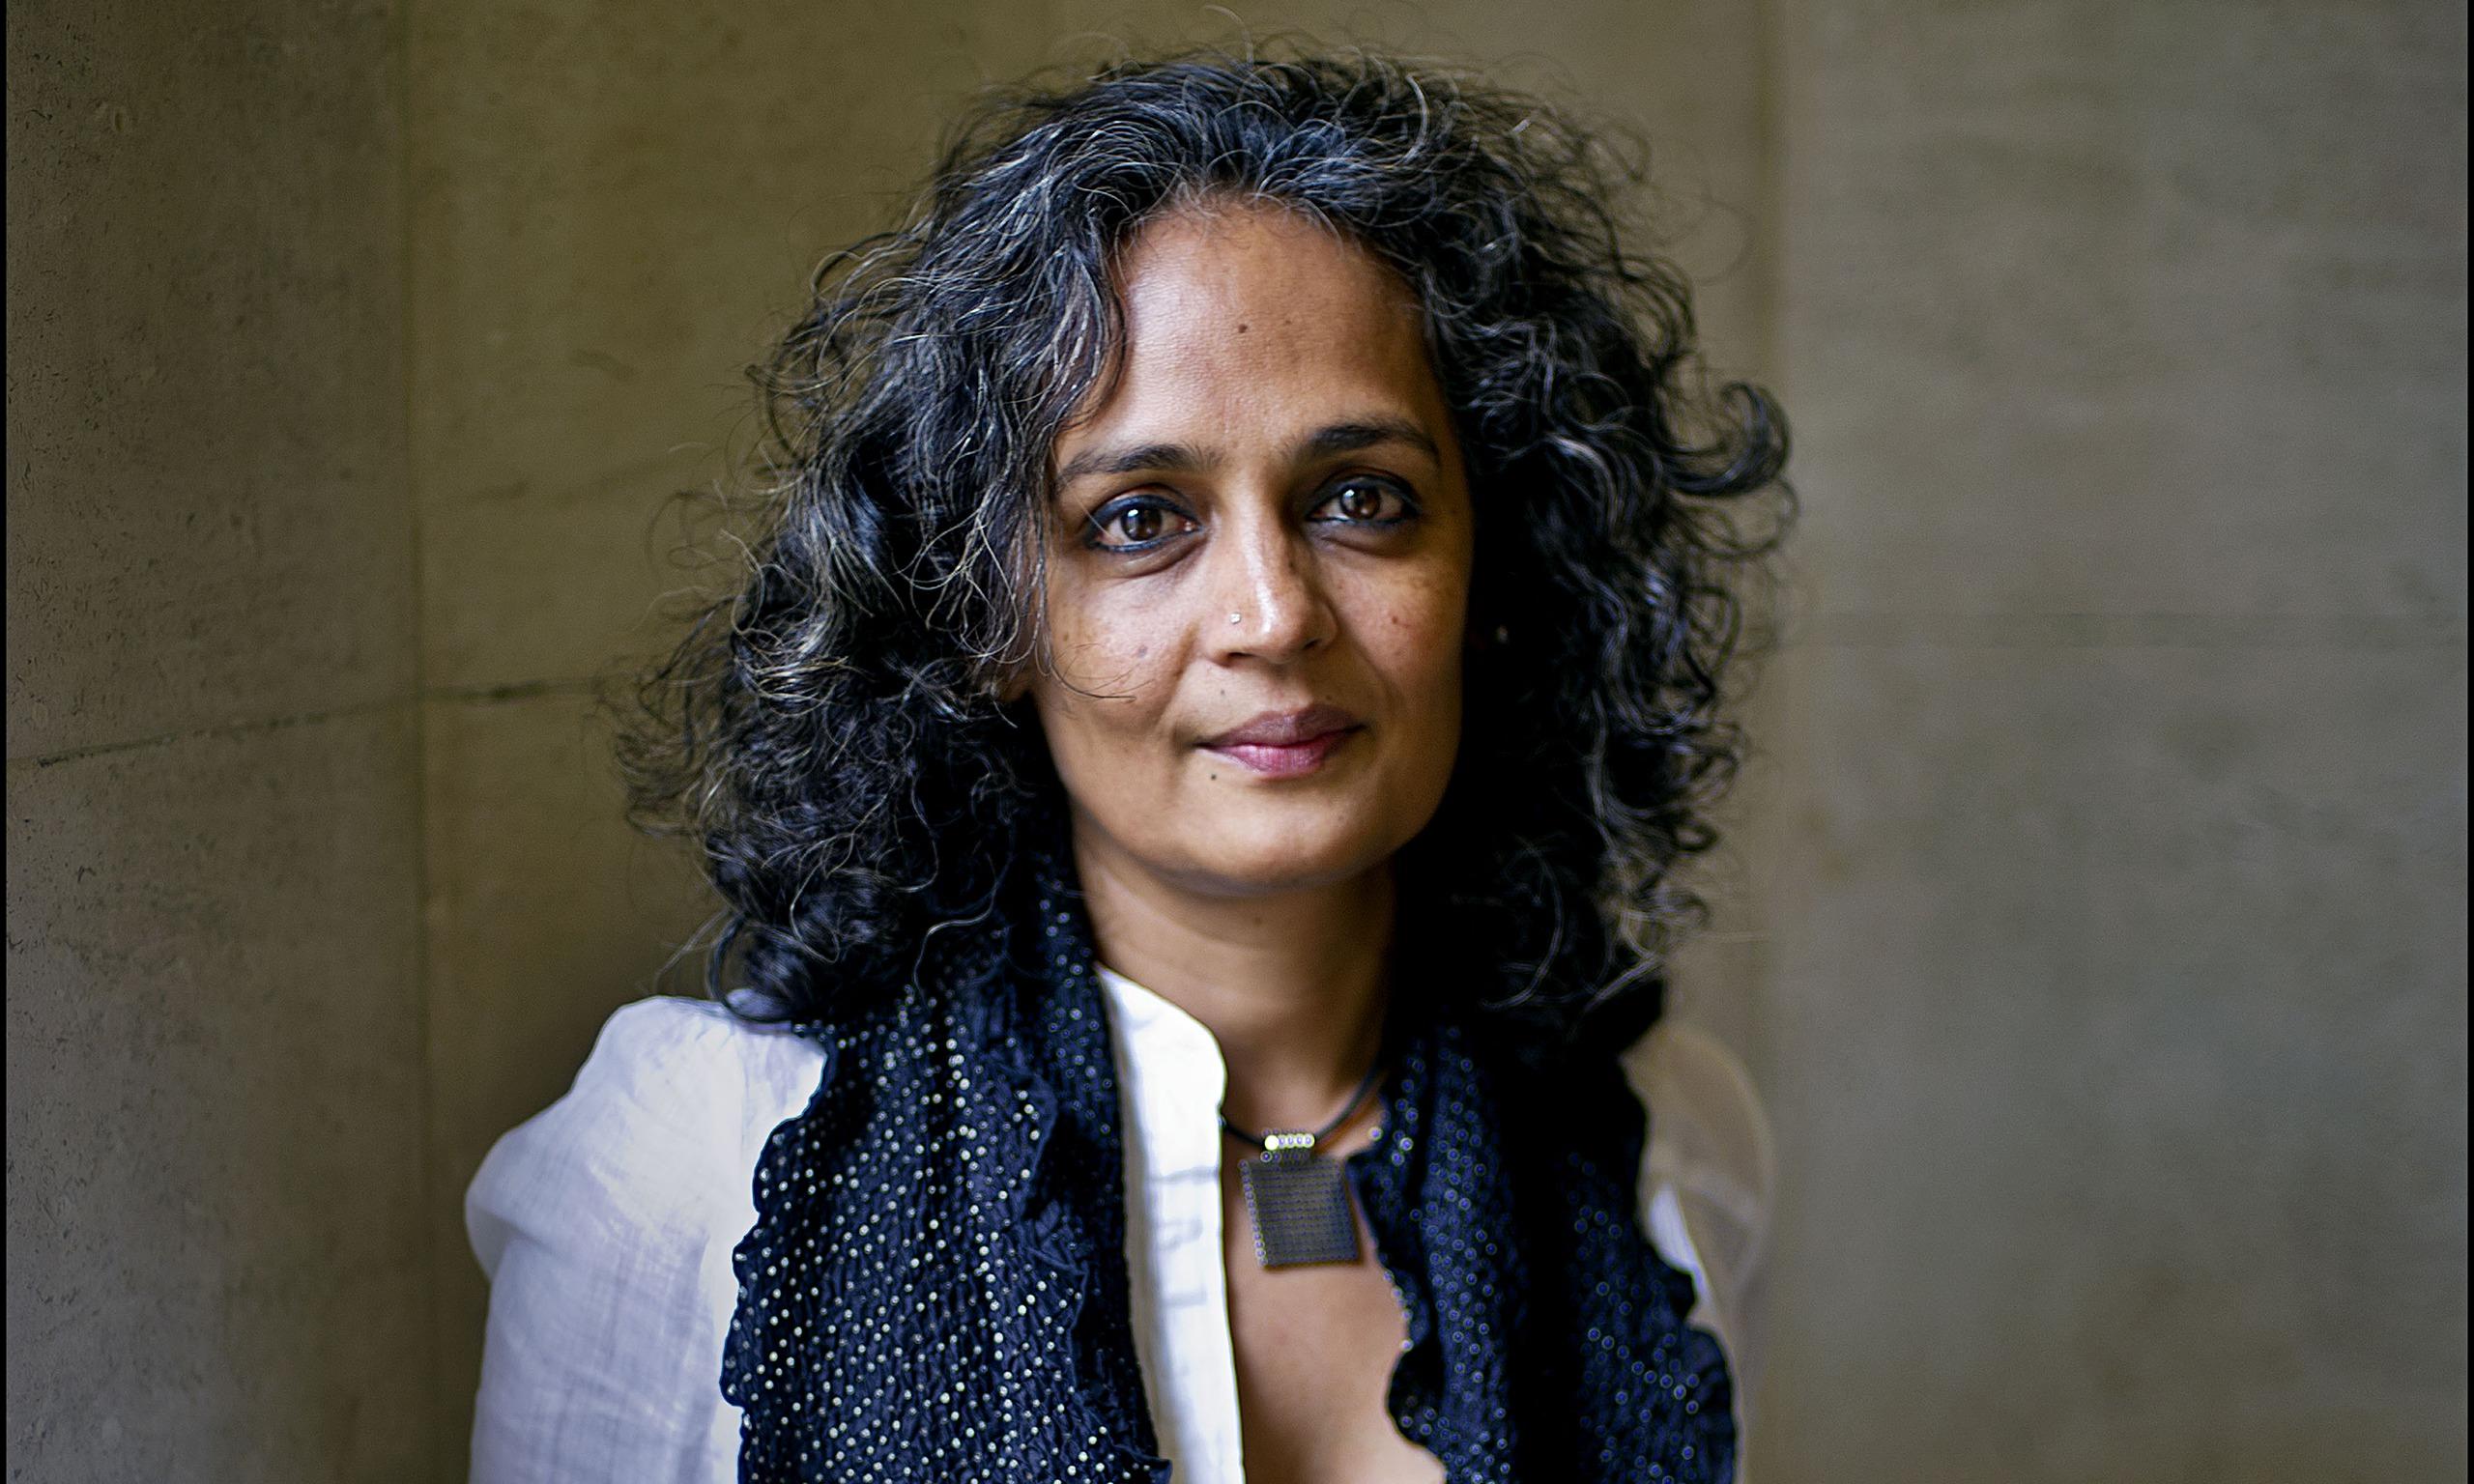 012 One2 Essay Example Essays By Arundhati Sensational Roy Full